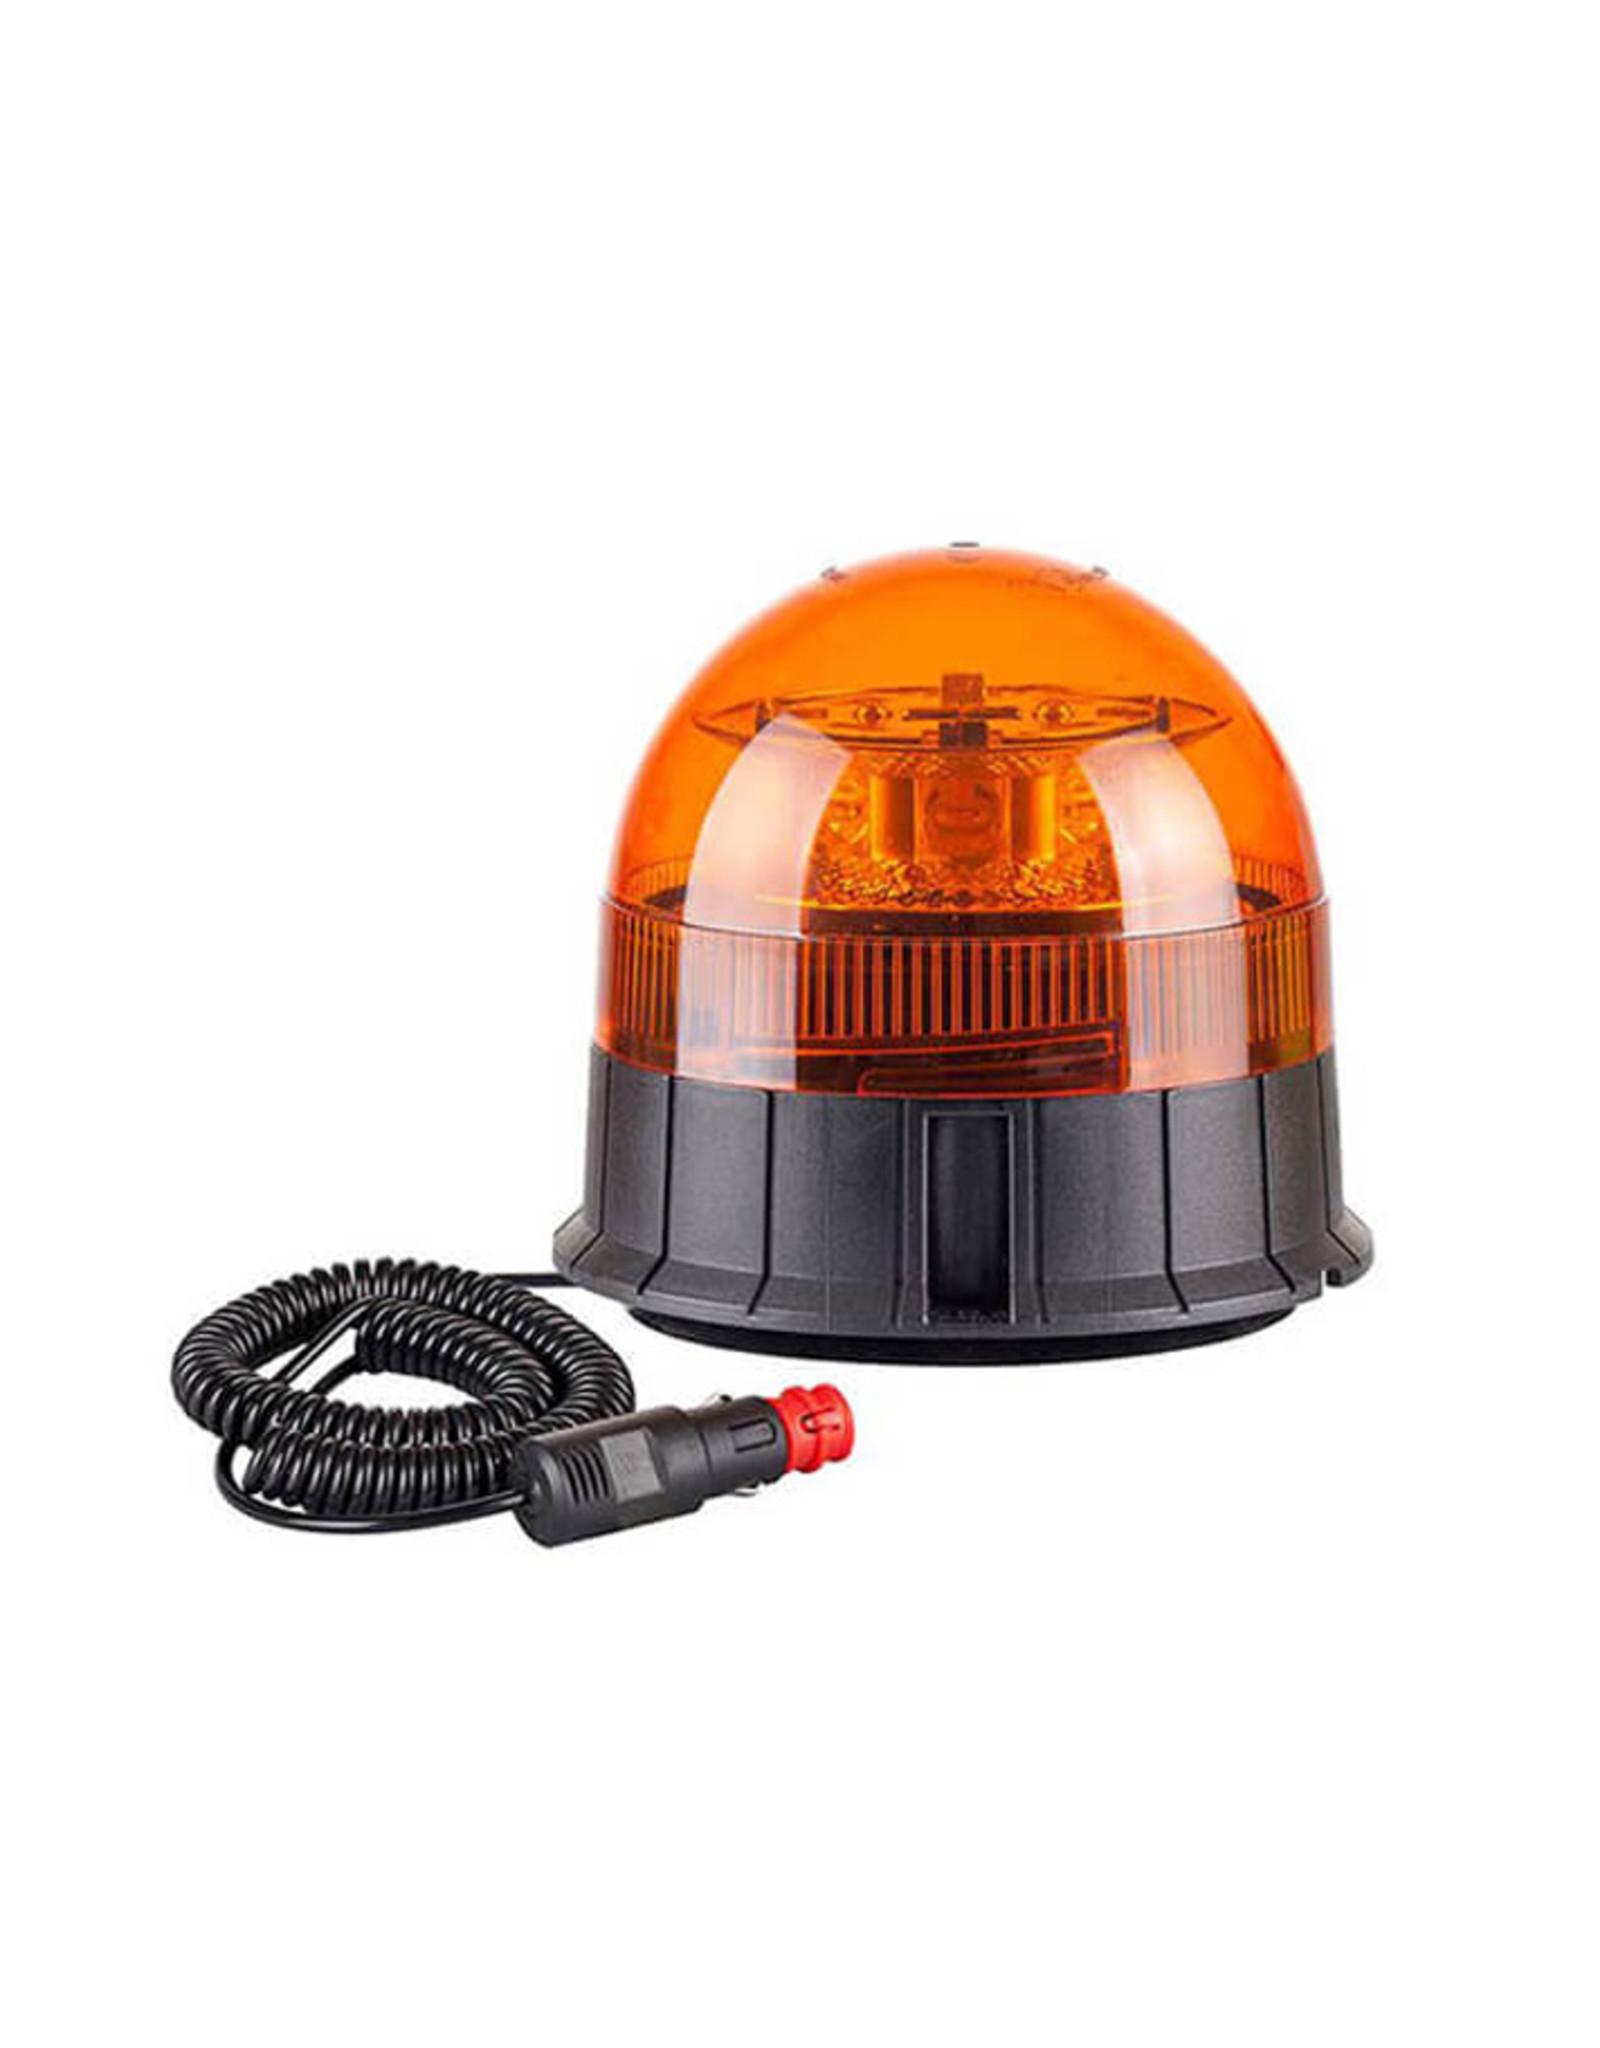 Ri-Traffic | Oranje LED Zwaailamp met Magneetvoet / Zuignapvoet (R65 Amber)